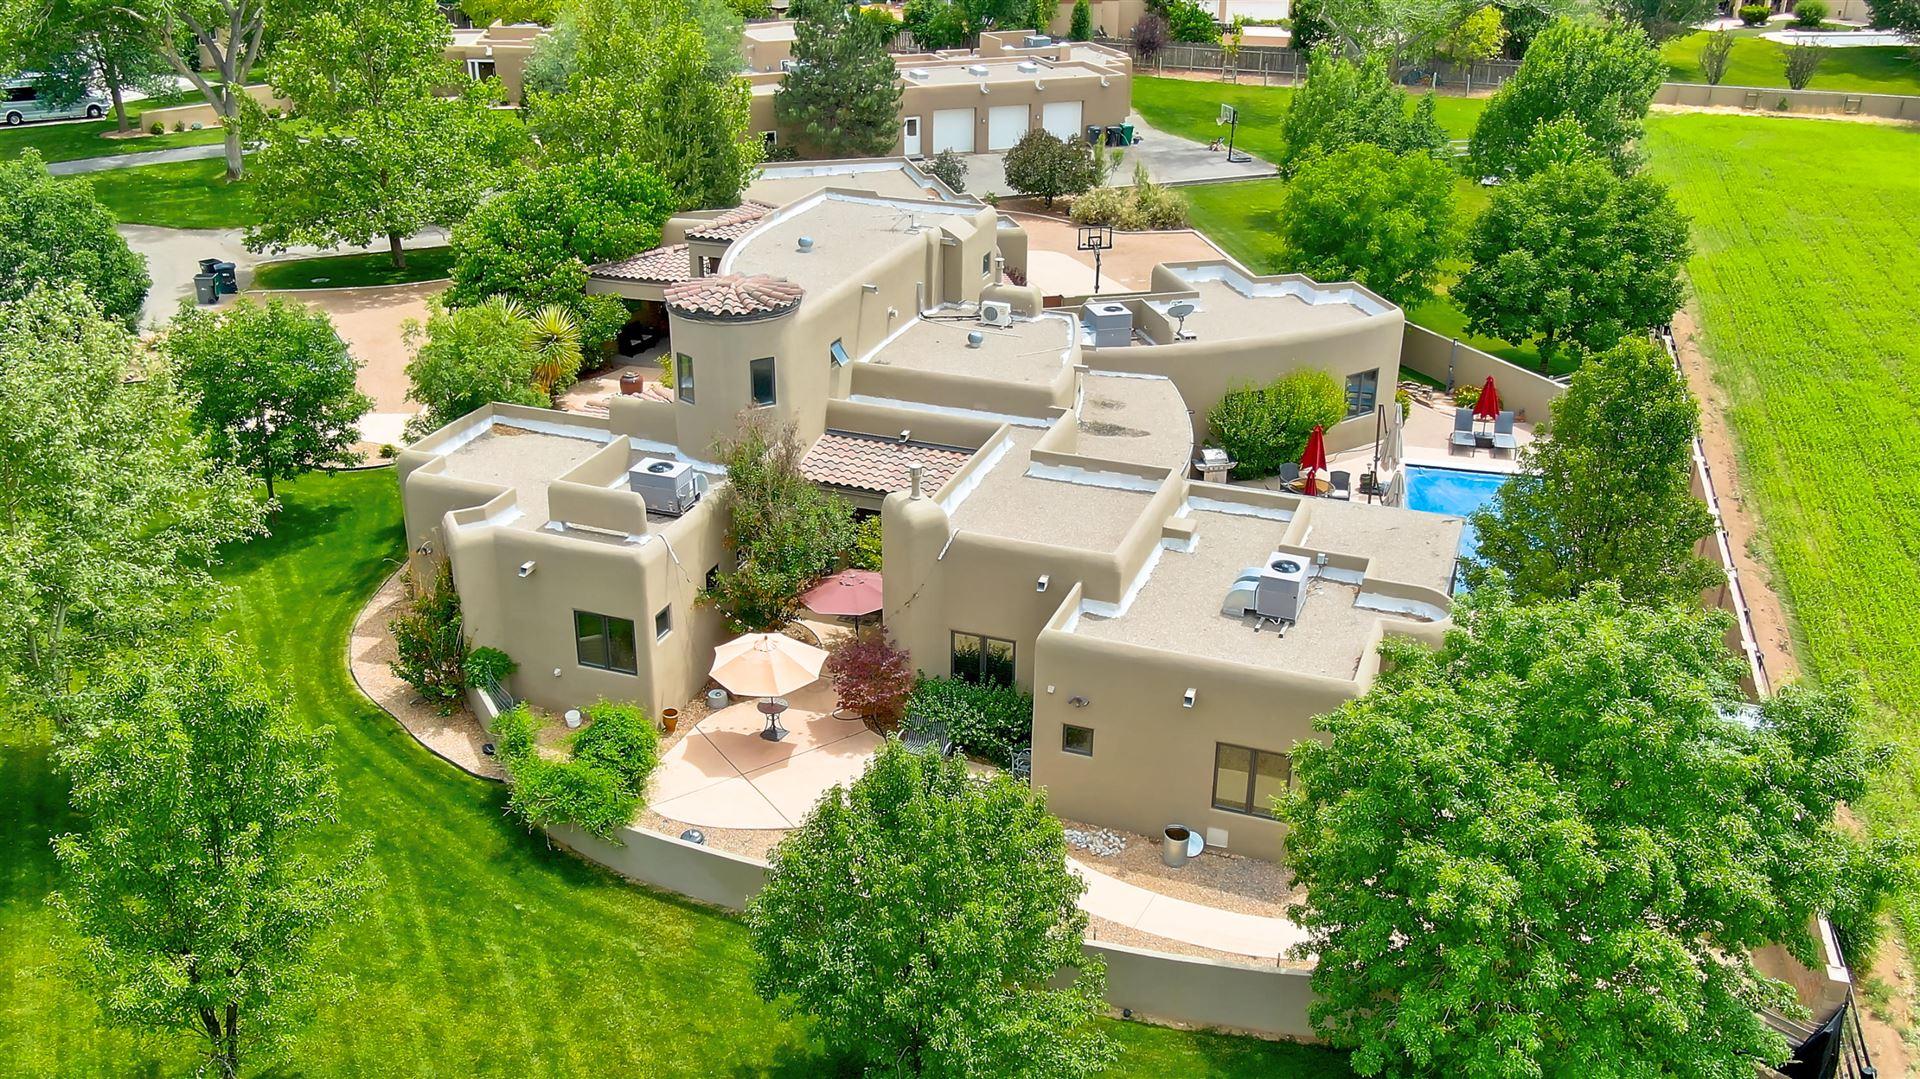 Photo of 1131 LANES END NW, Albuquerque, NM 87114 (MLS # 969960)